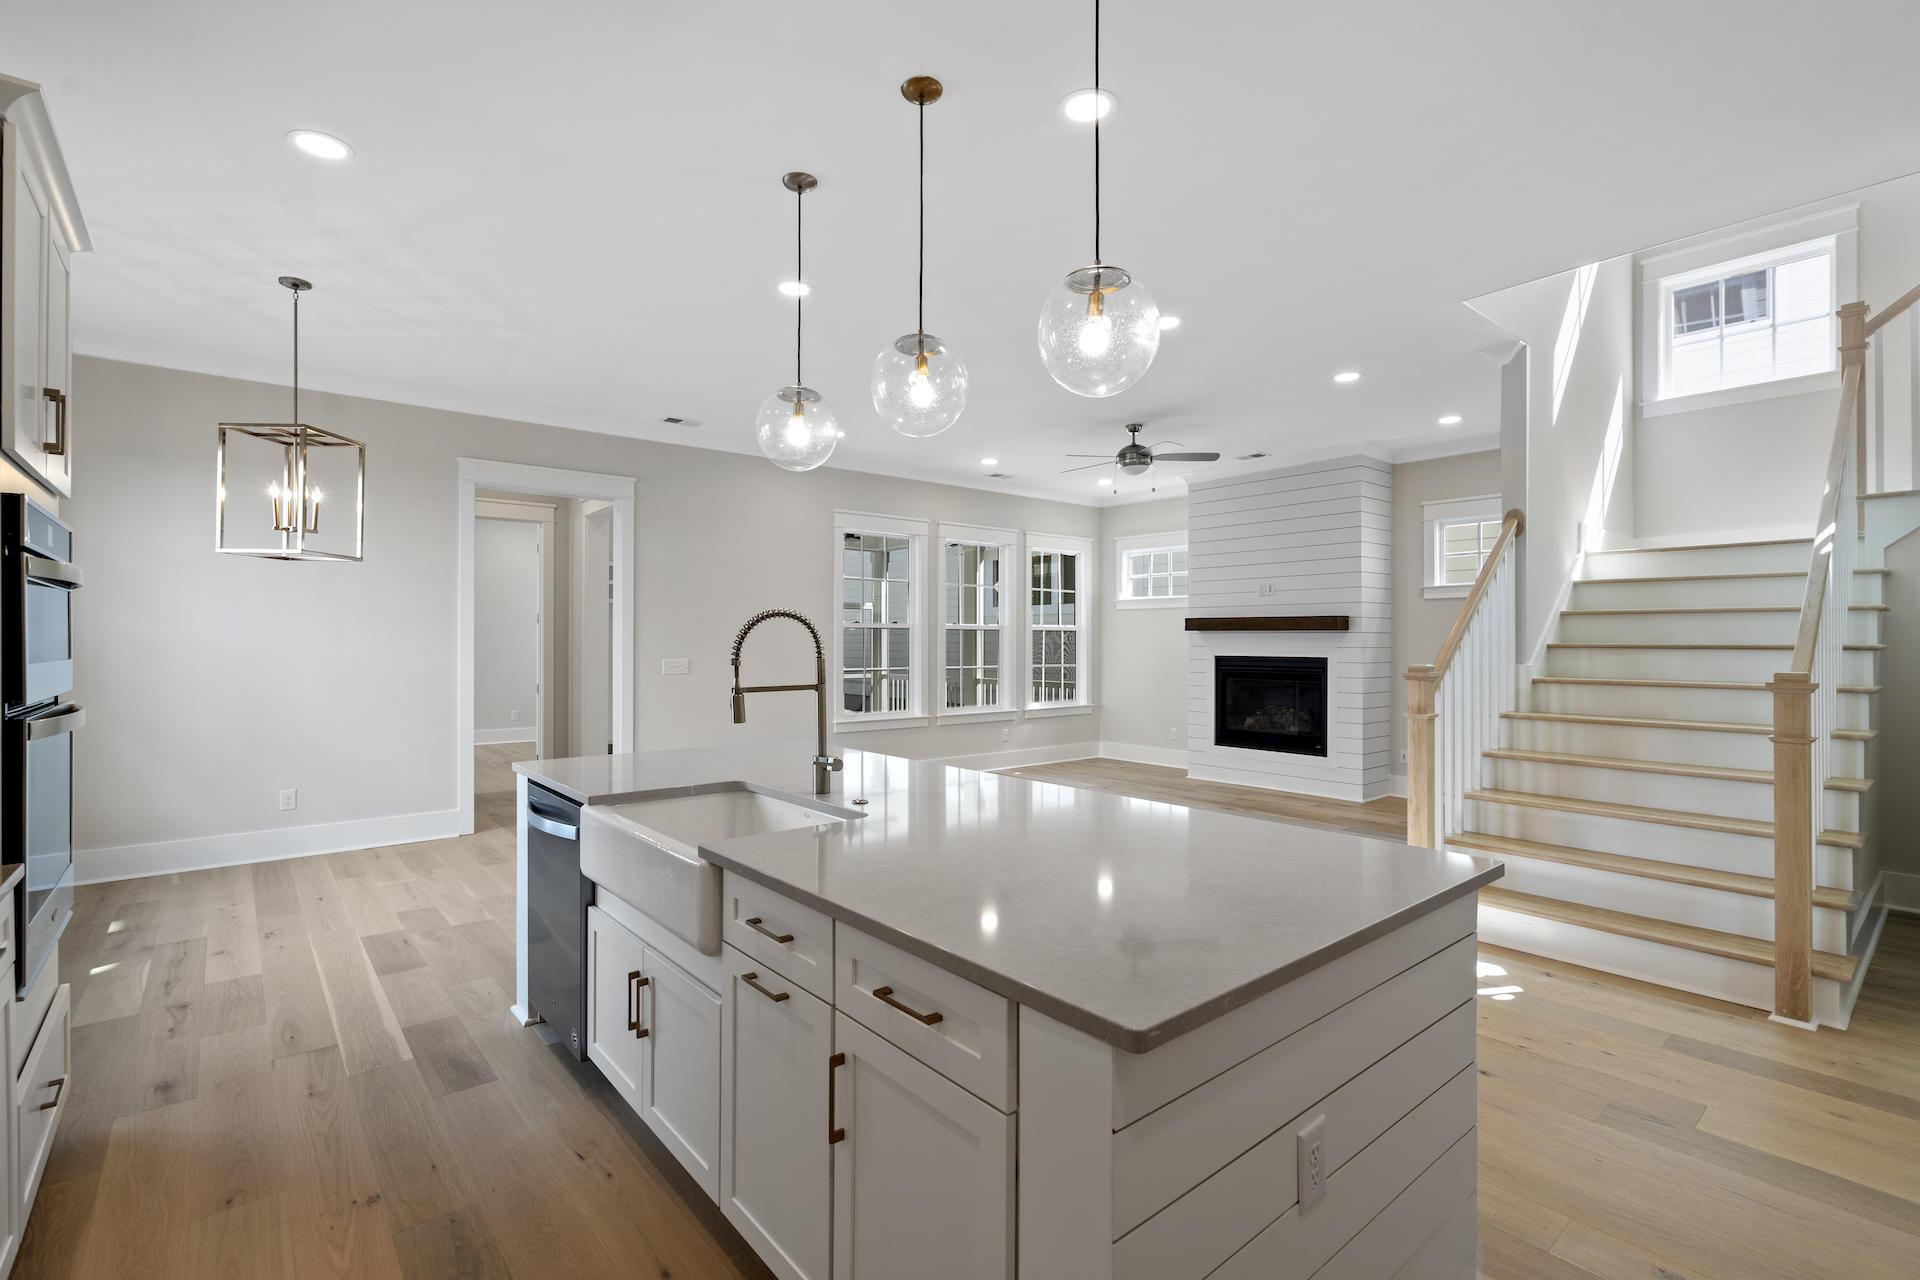 Midtown Homes For Sale - 1328 Upper Union, Mount Pleasant, SC - 24